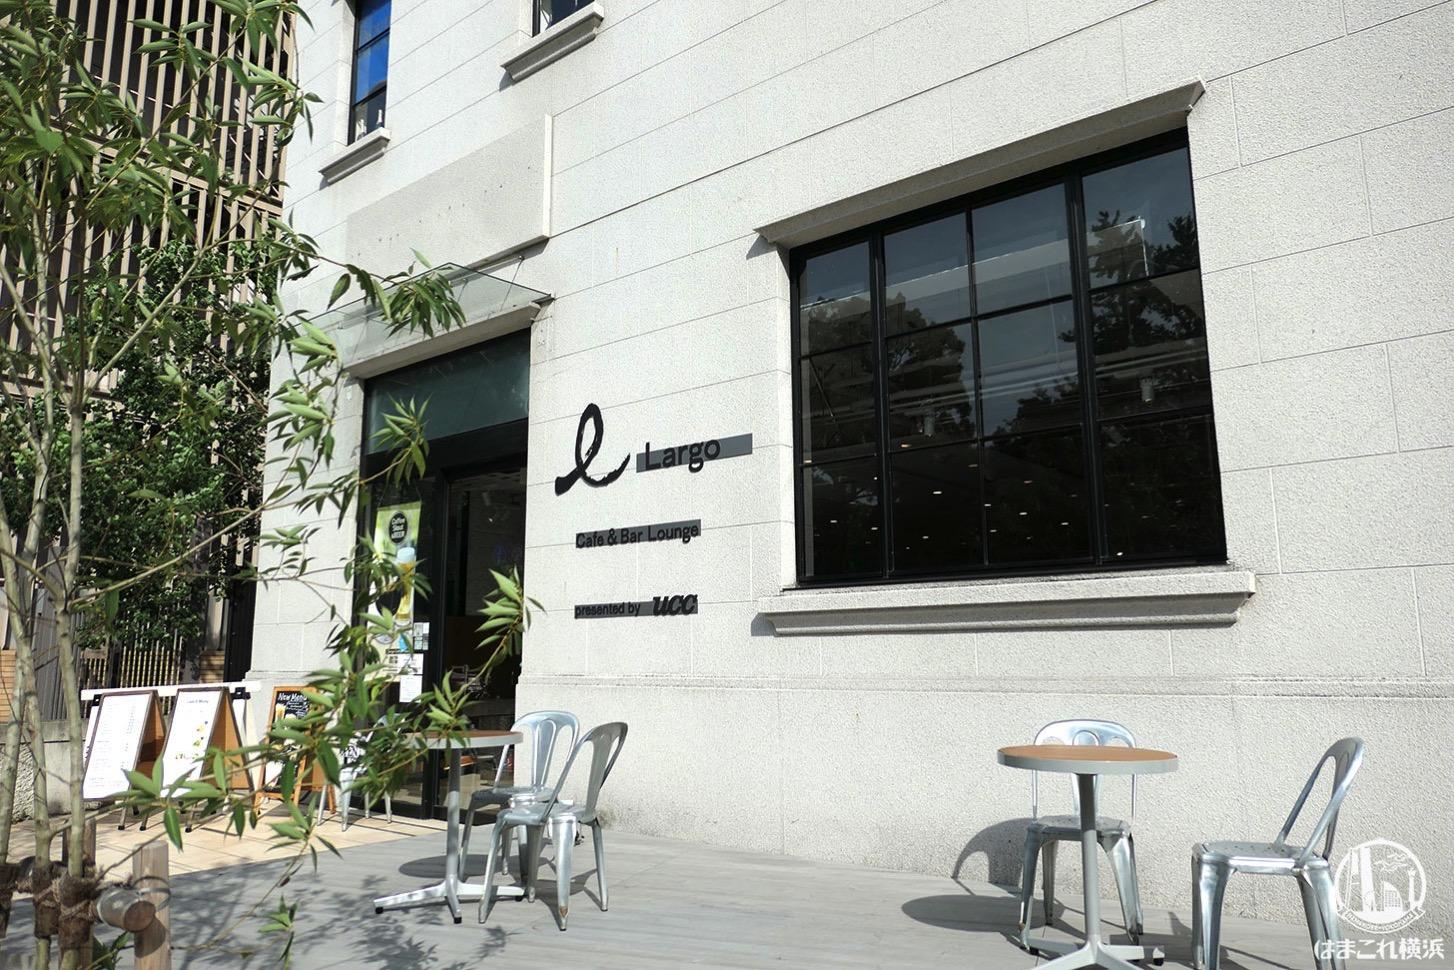 Largo Cafe & Bar Lounge presented by UCC 外観